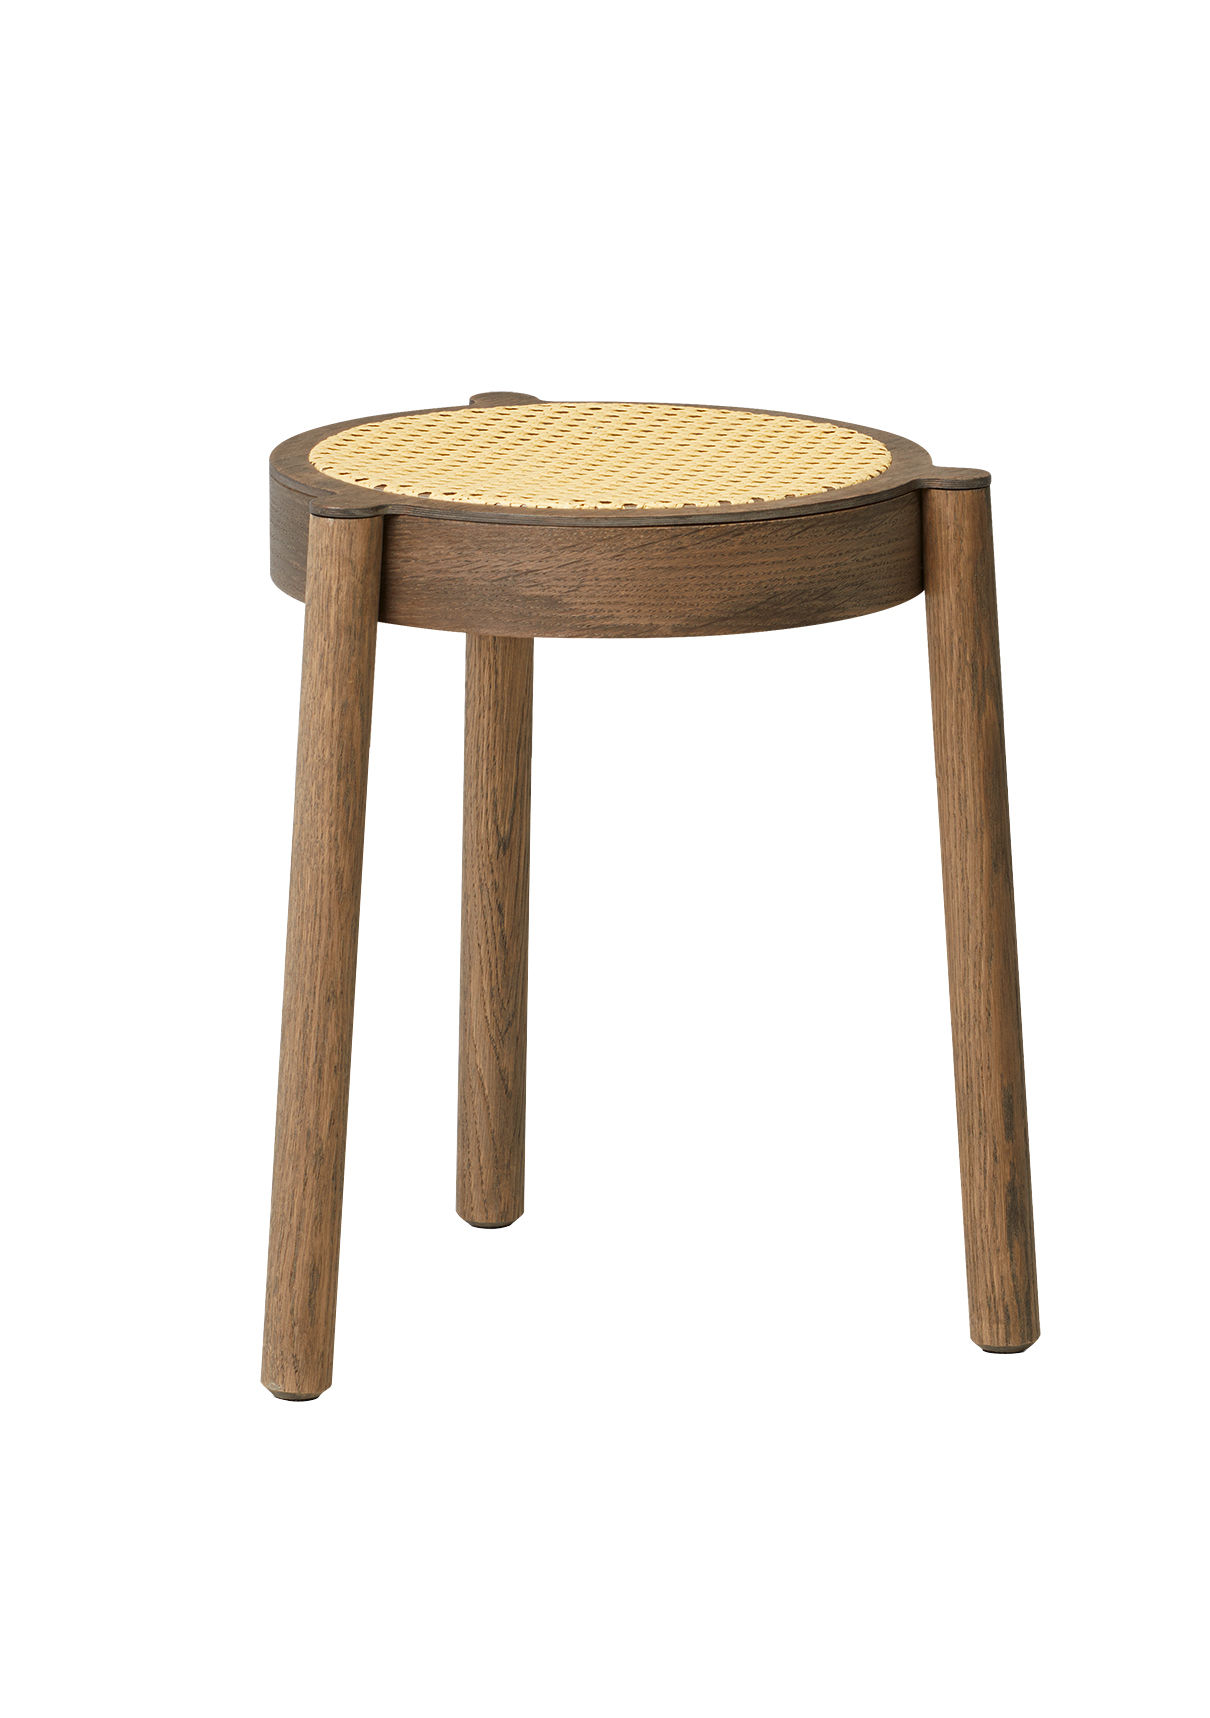 Furniture - Stools - Pal Stool - / Wood & teak by Northern  - Smoked oak / Wicker - Rattan, Solid smoked oak